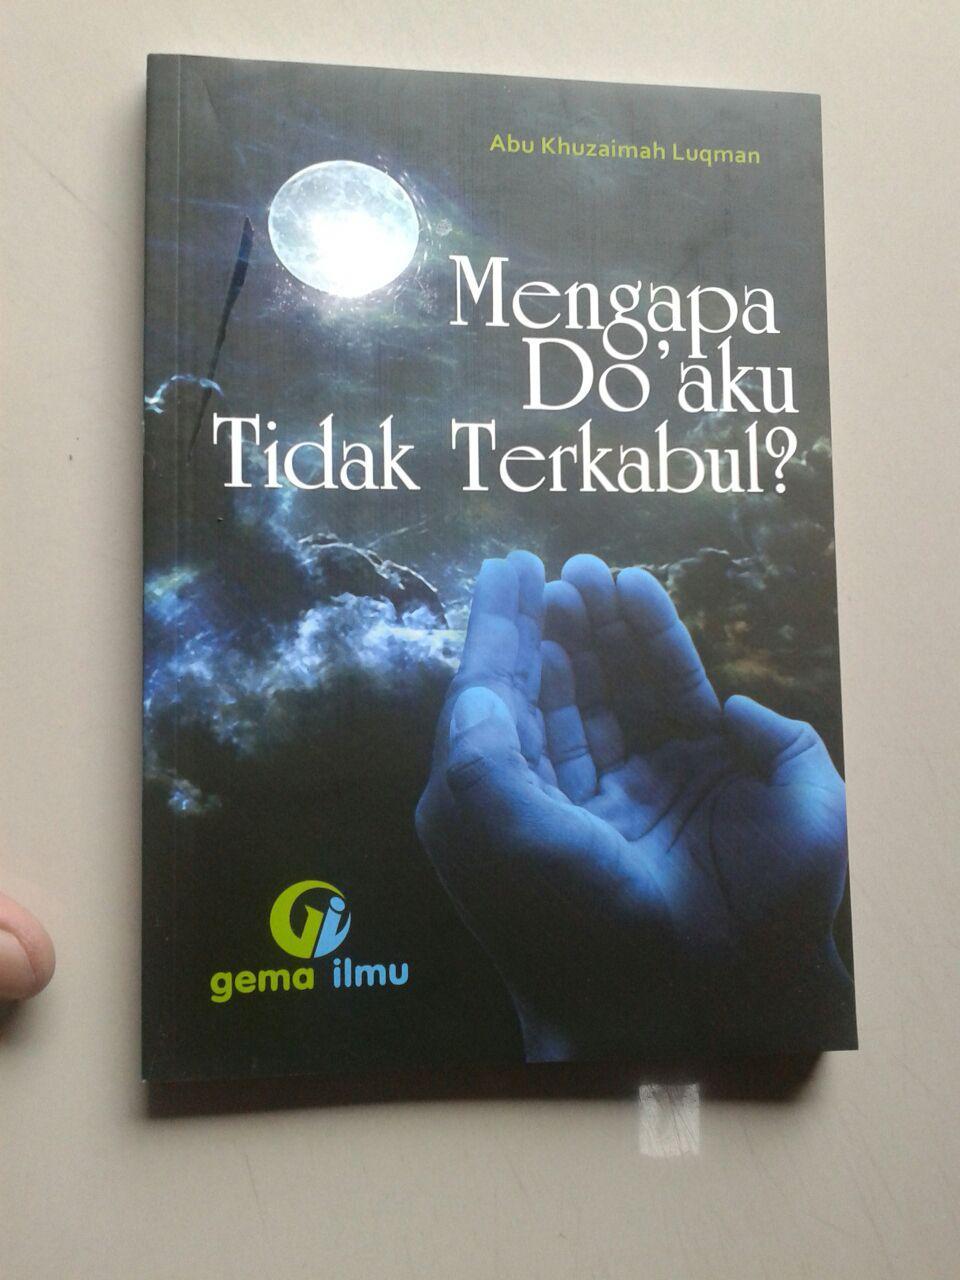 Buku Mengapa Do'aku Tidak Terkabul? cover 2